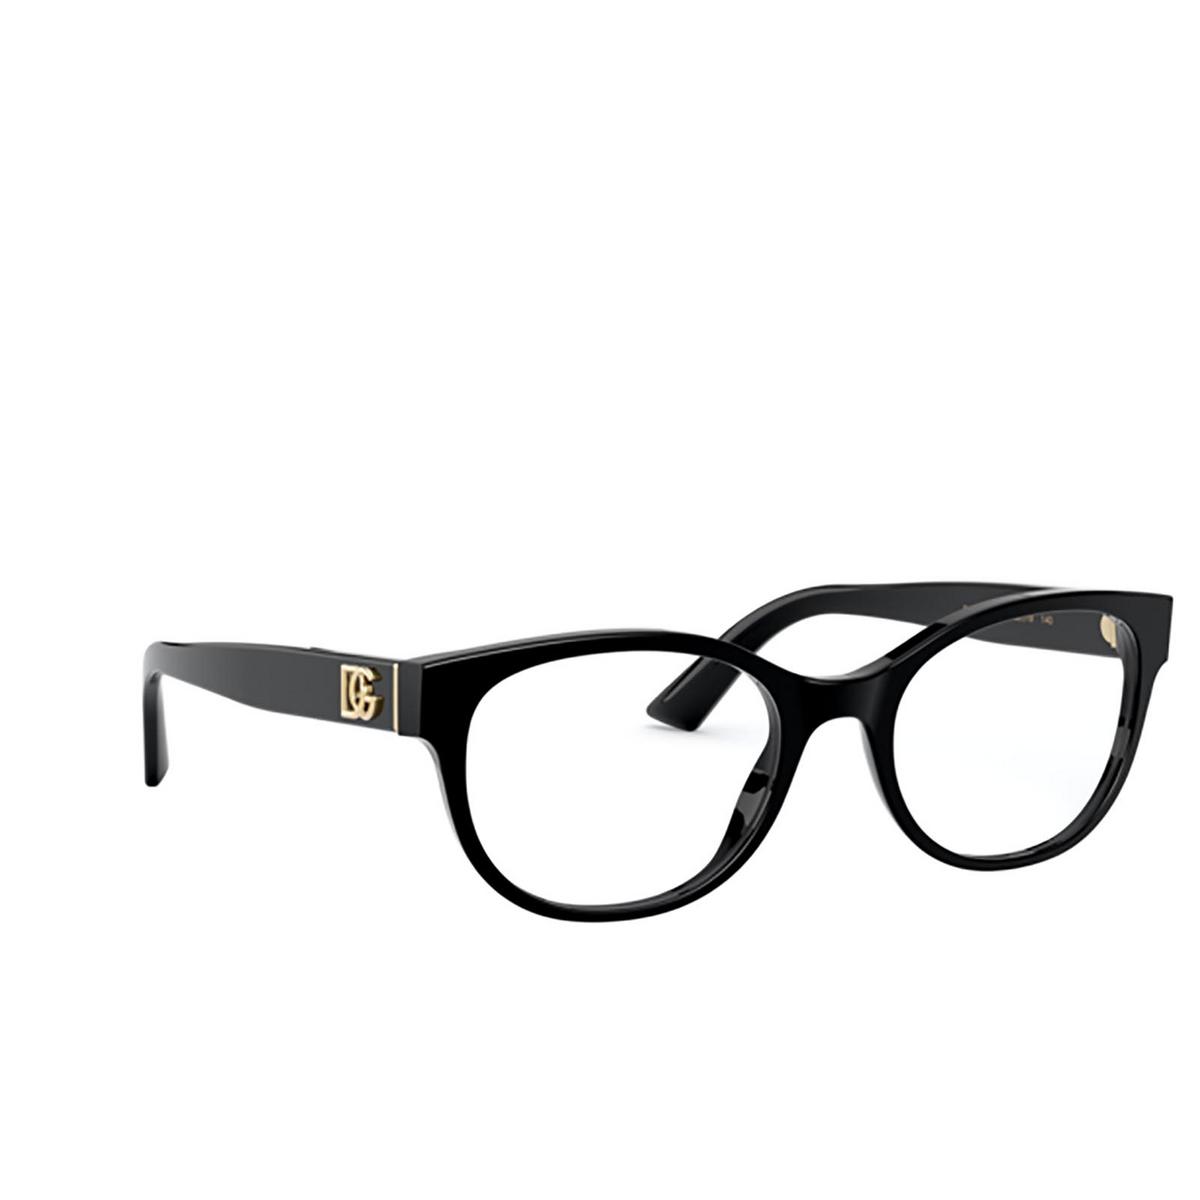 Dolce & Gabbana® Oval Eyeglasses: DG3327 color Black 501 - three-quarters view.